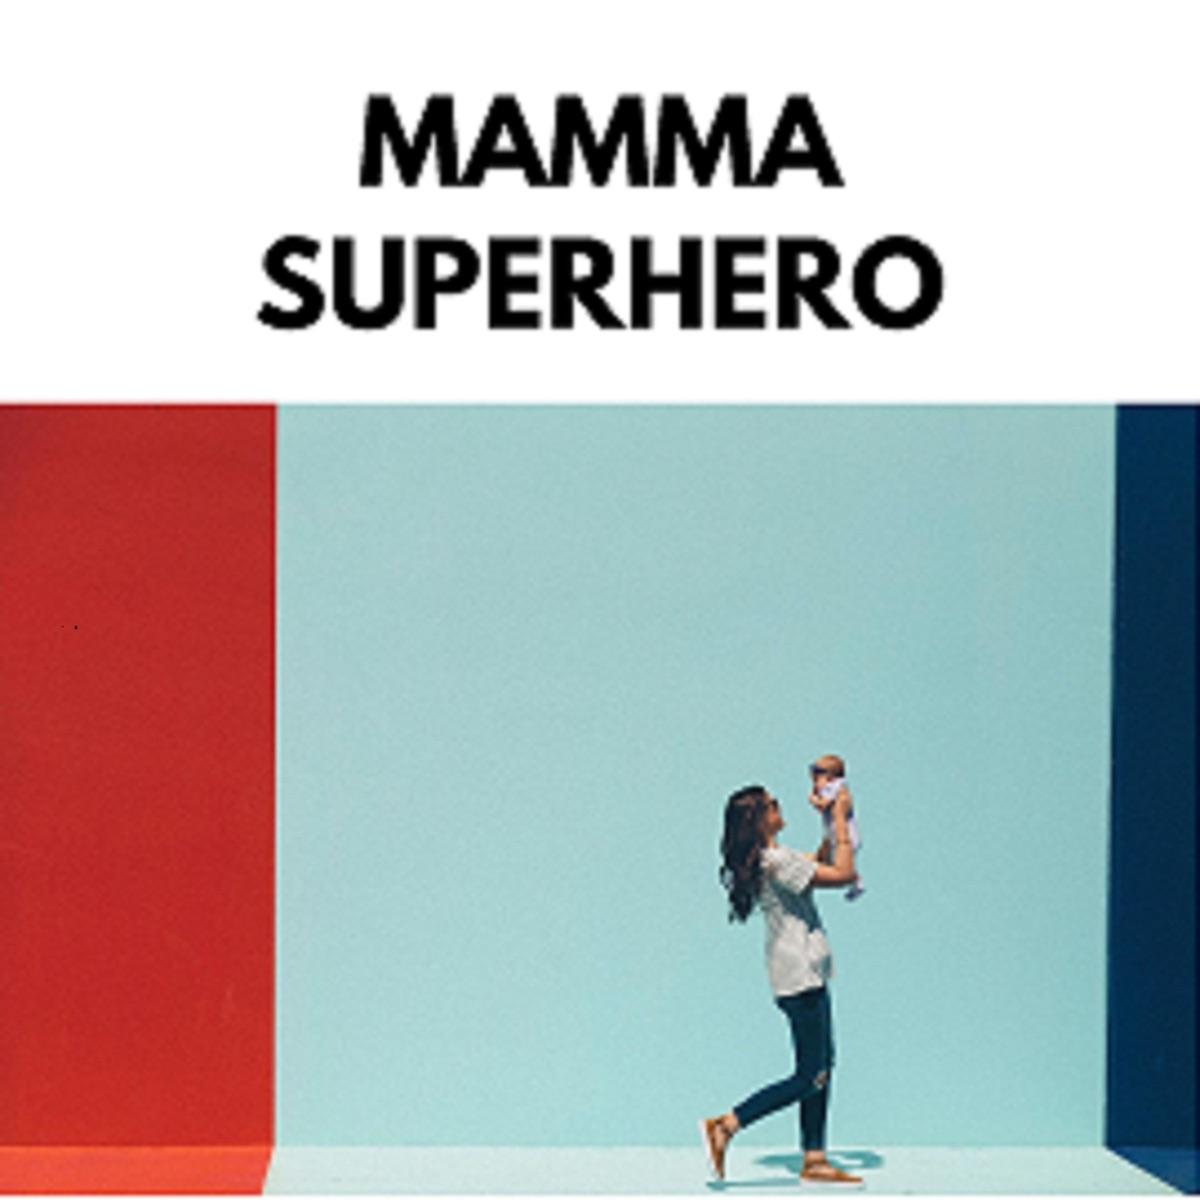 Mamma Superhero